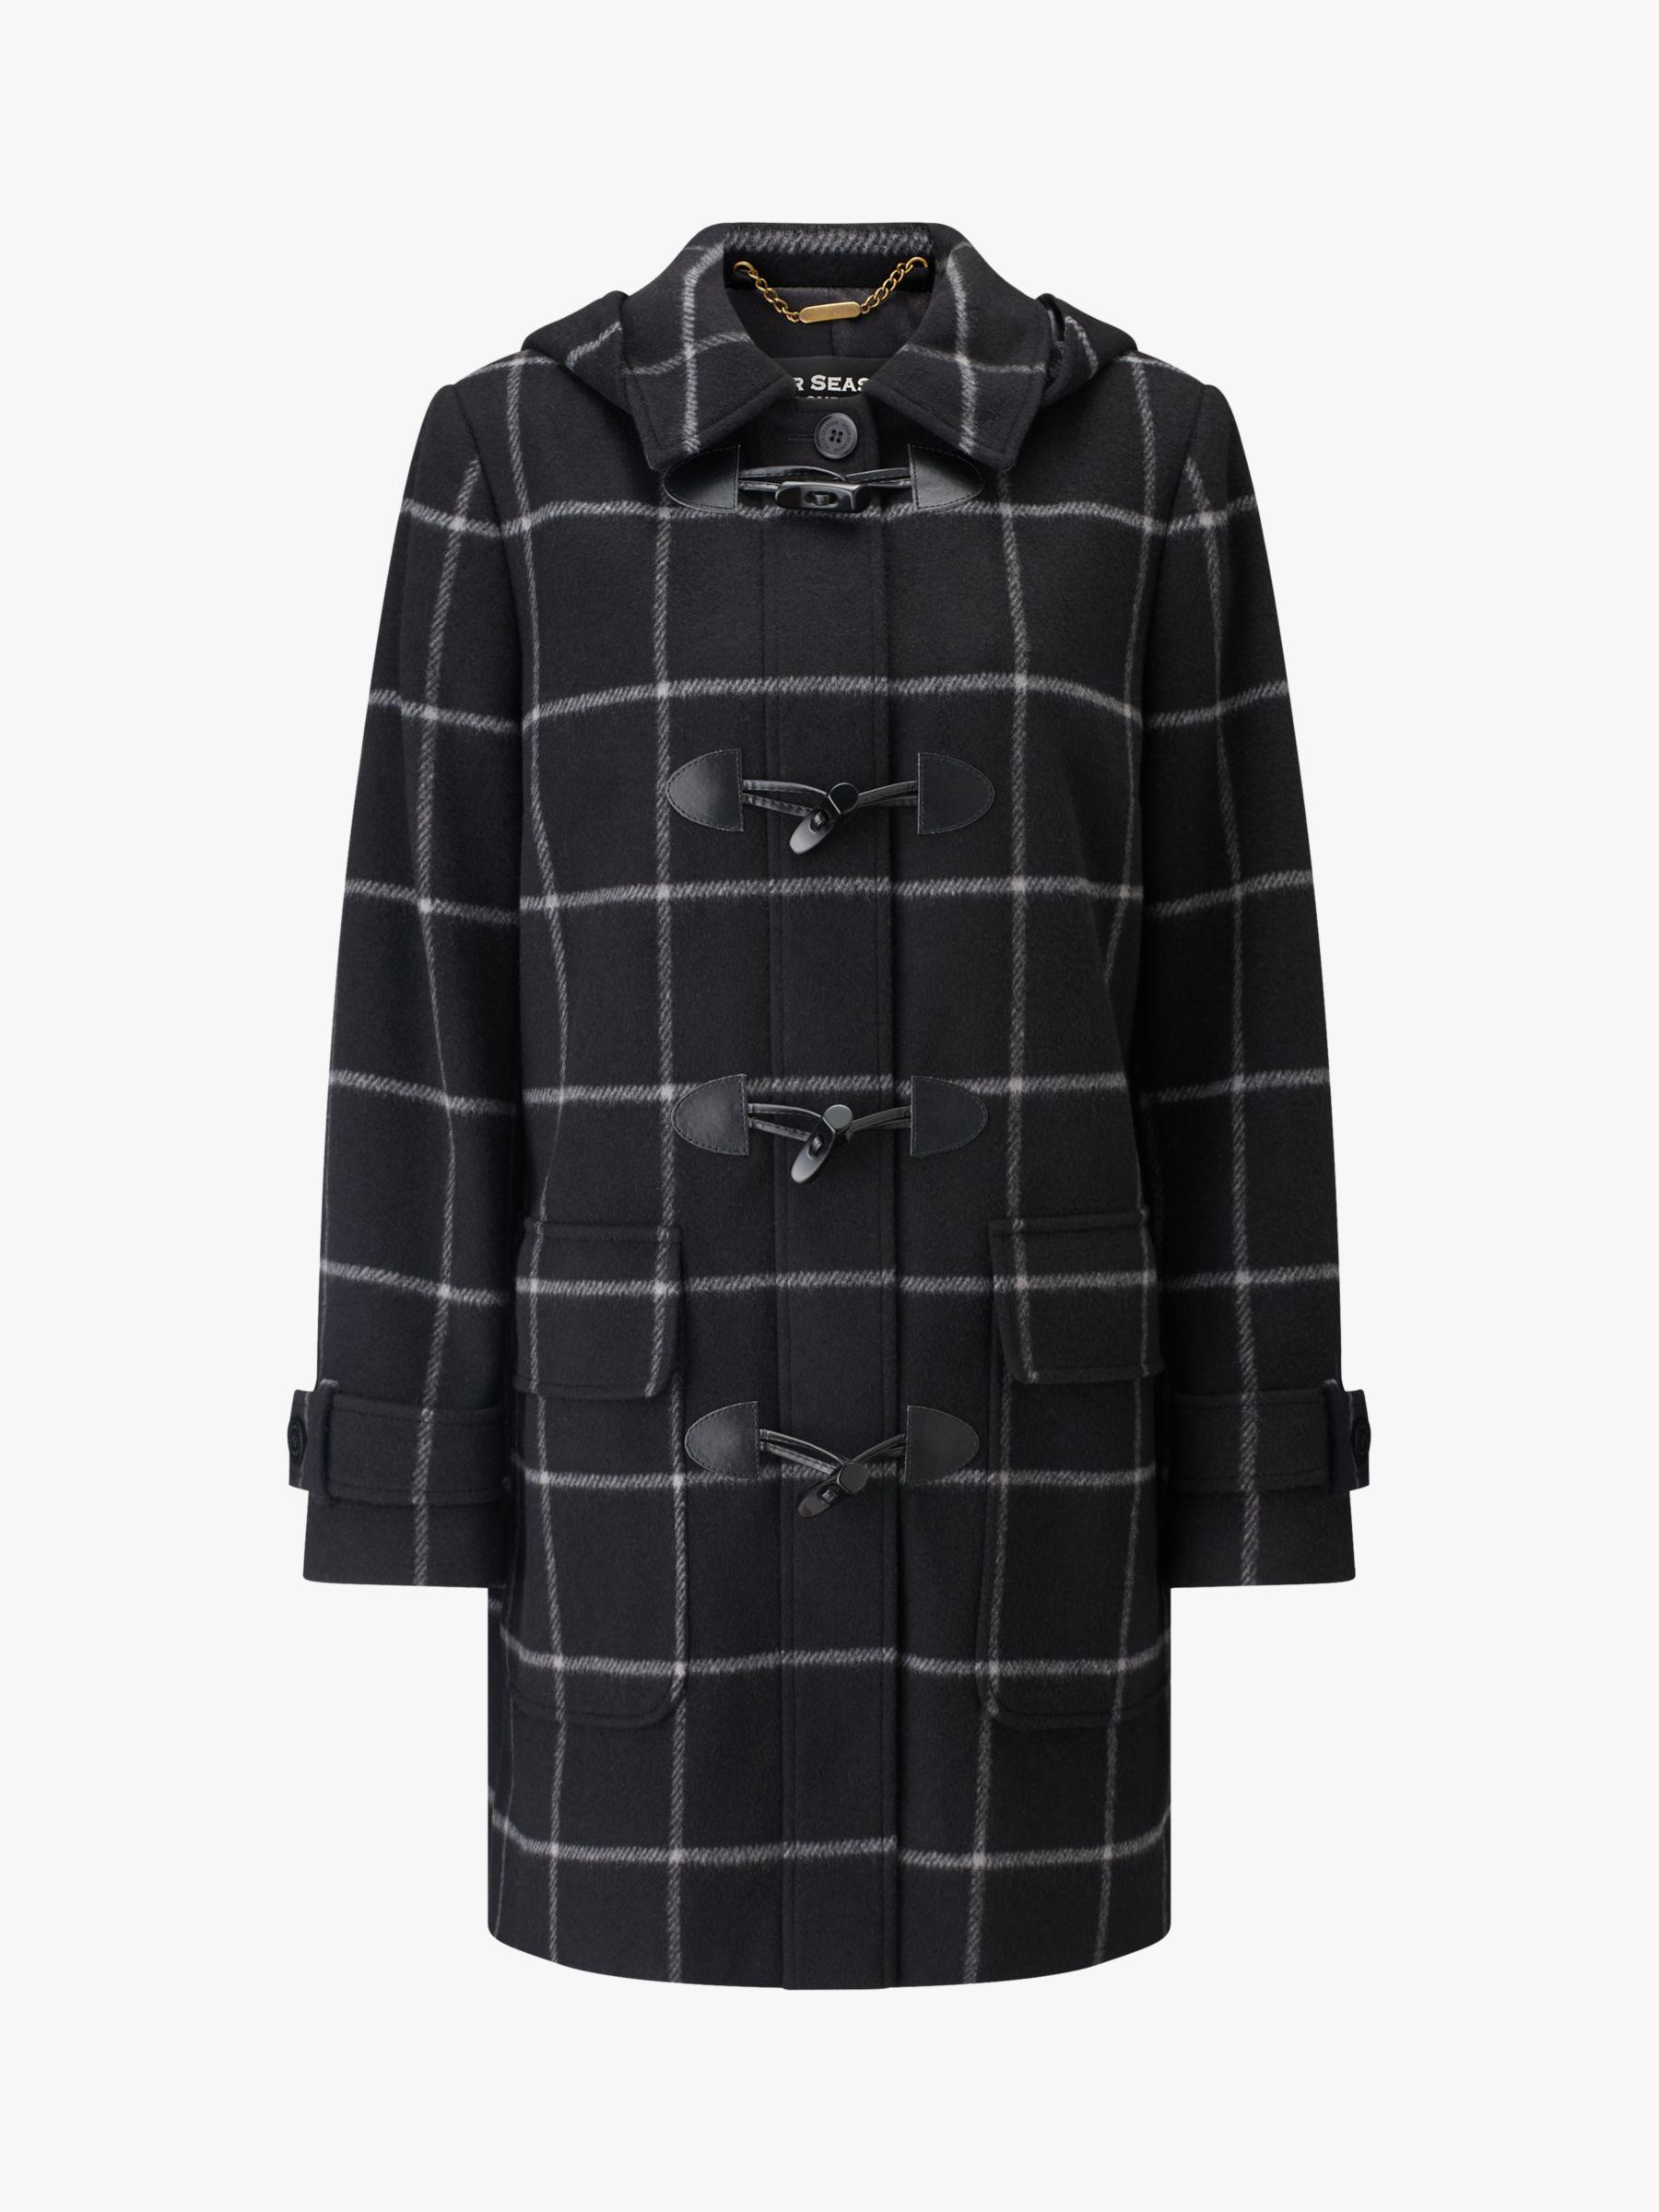 Four Seasons Four Seasons Check Duffle Coat, Black